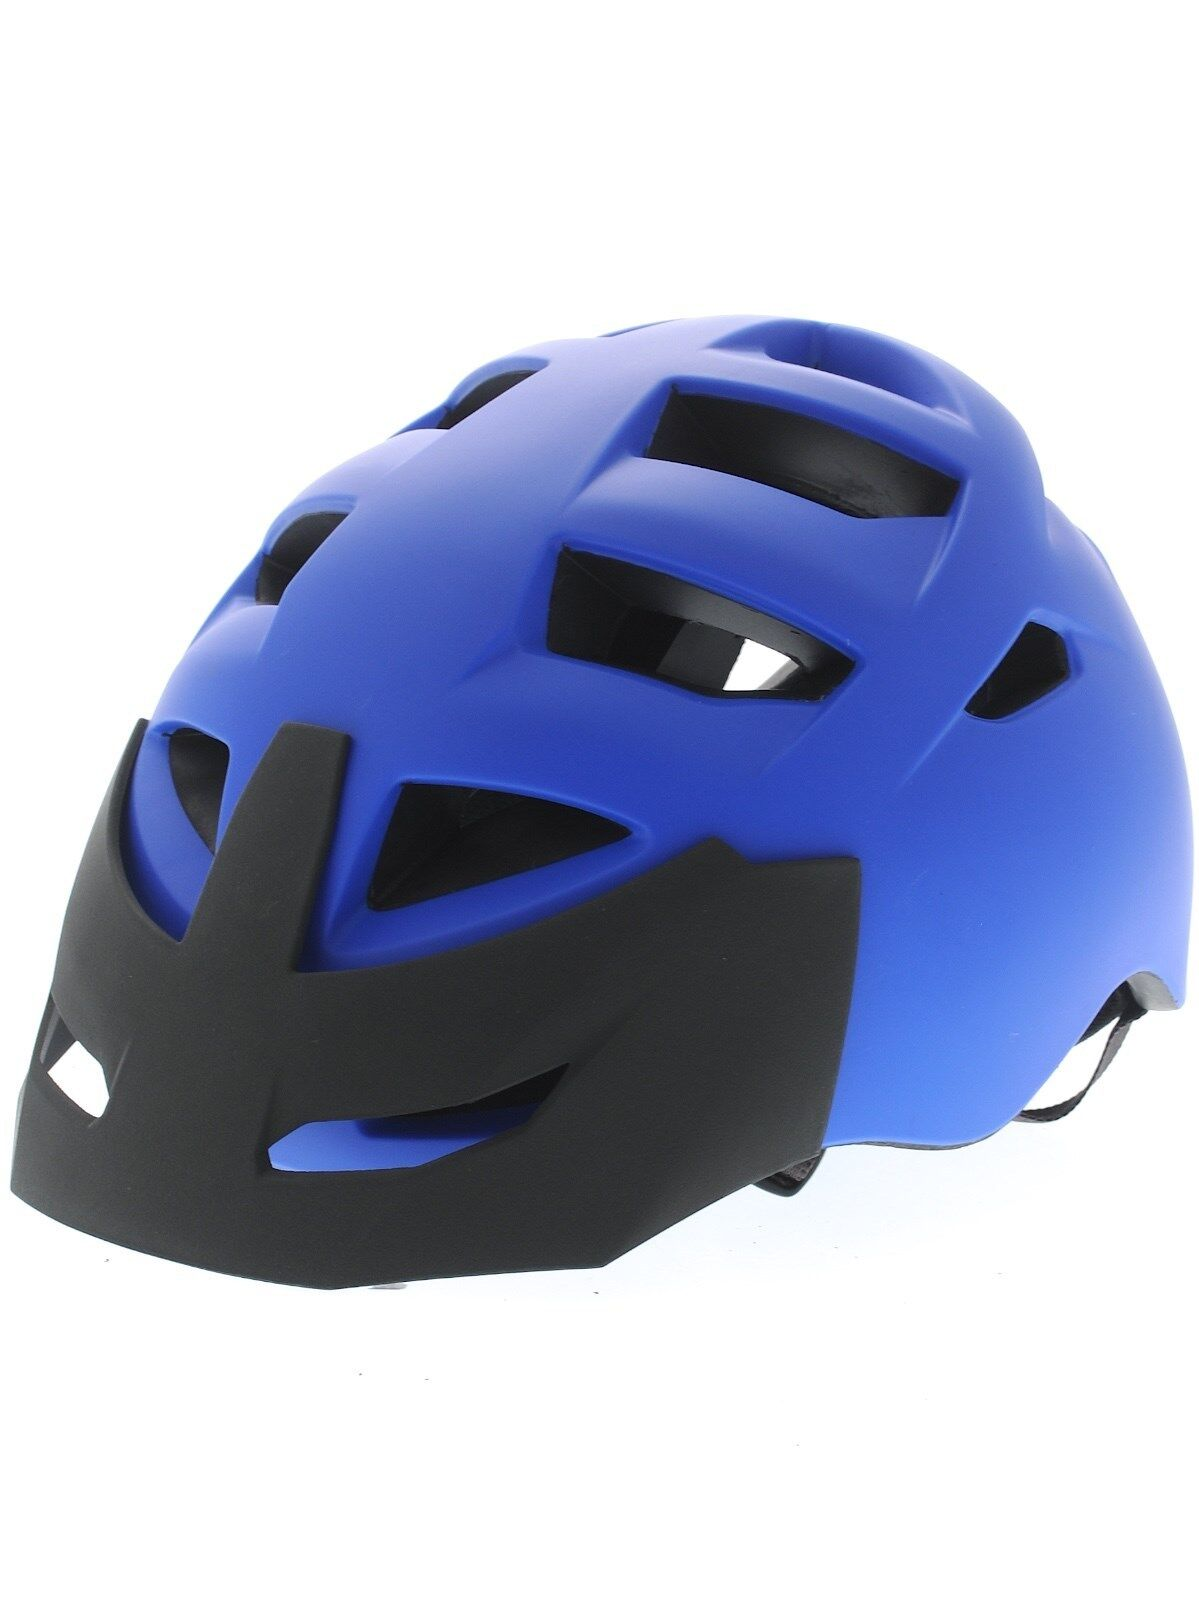 Bern Morrison Zipmold Bicicletta Casco da Bicicletta,Gara Blu S-M L-XL XXL-XXXL